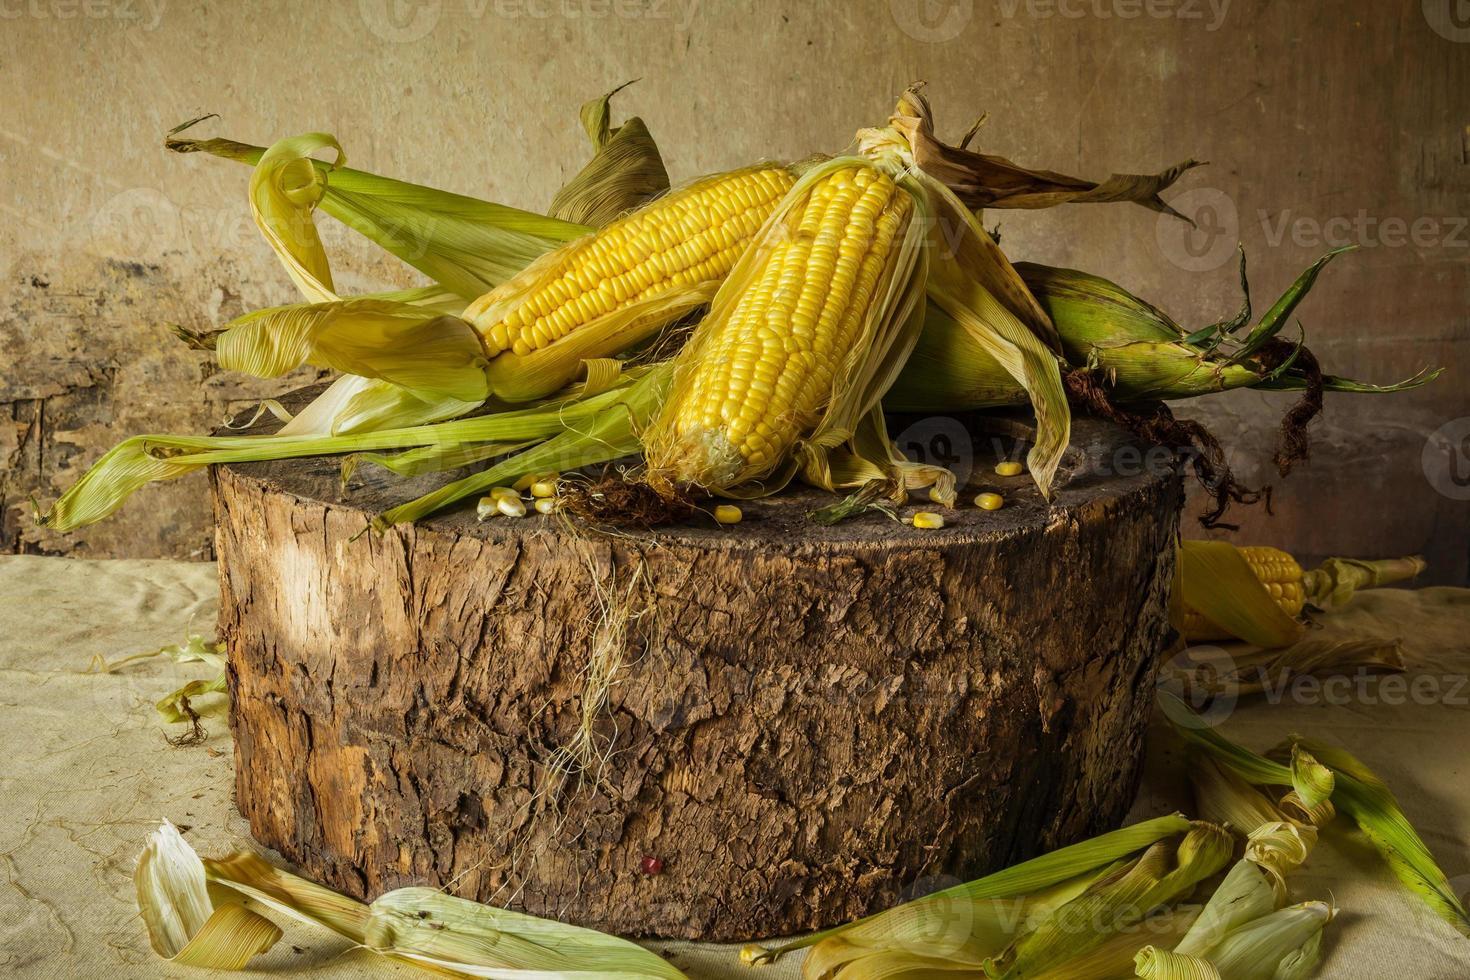 Still life with corn photo